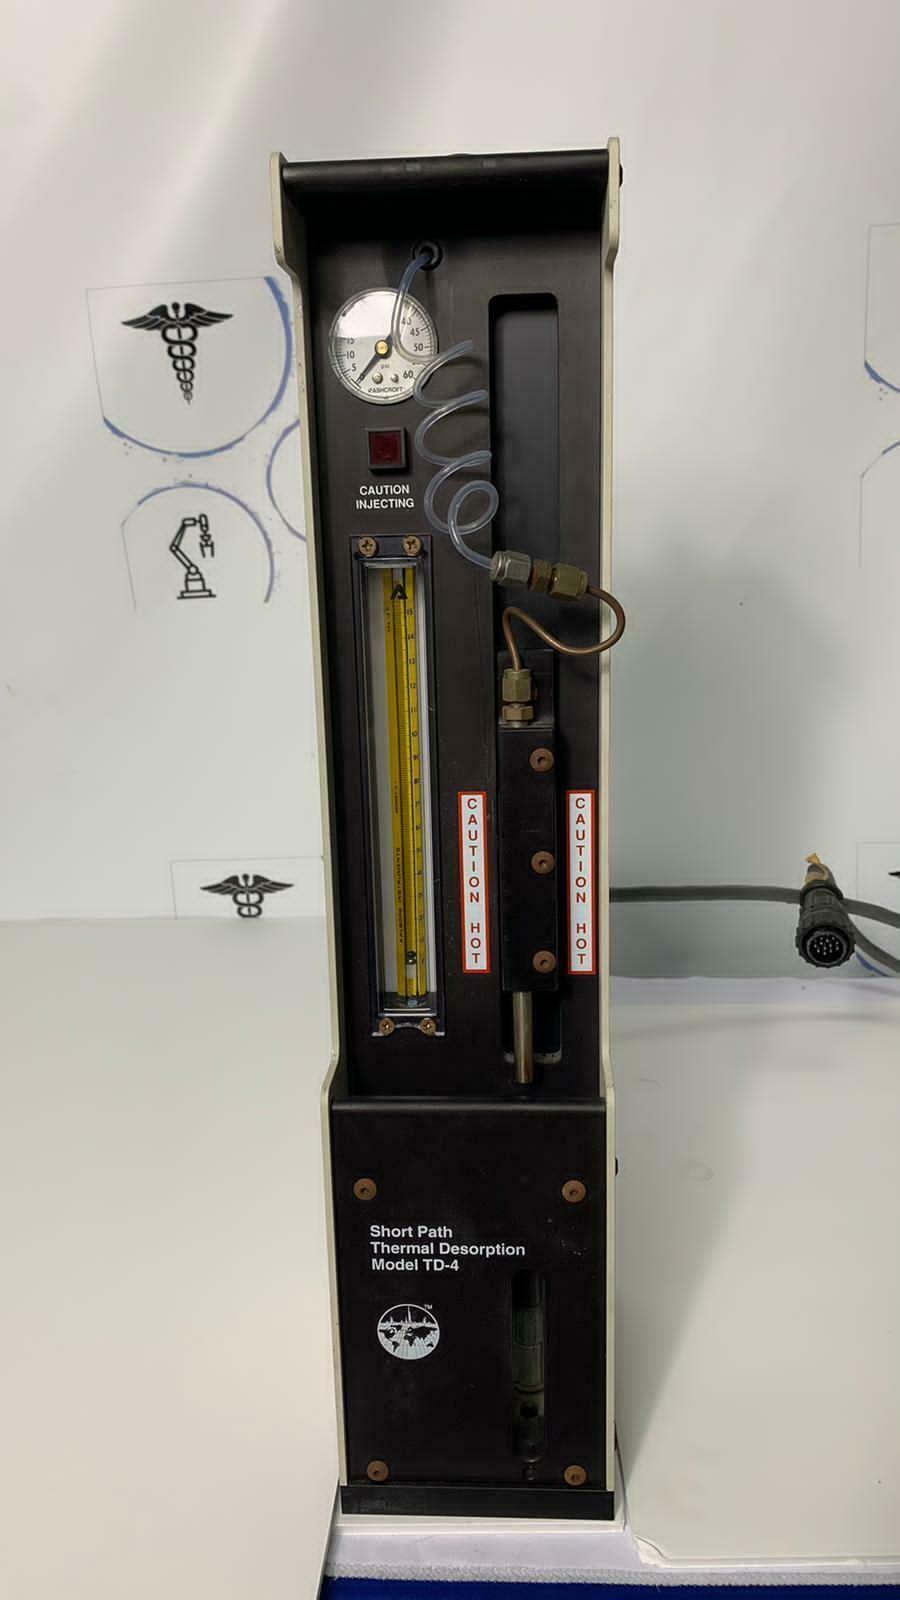 Scientific Instrument Services - Short Path Thermal Desorption System Model TD-4